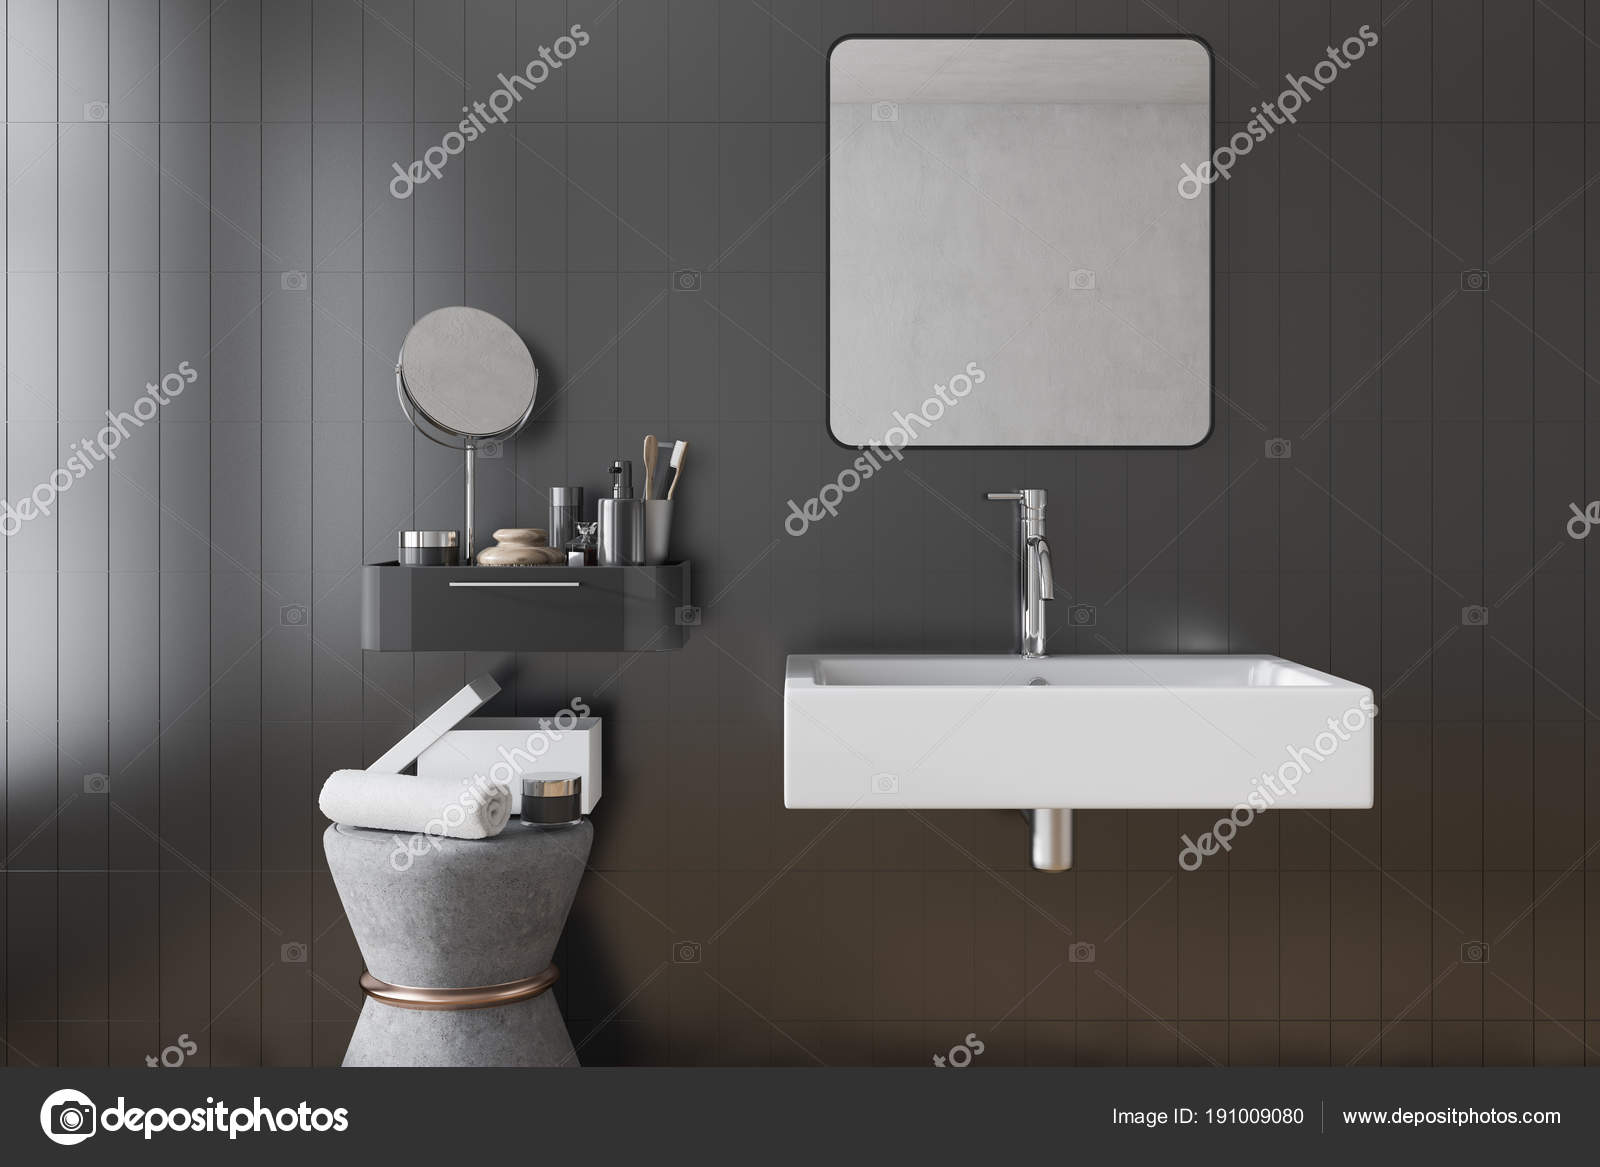 Zwarte vierkante badkamer wastafel interieur tegels u2014 stockfoto